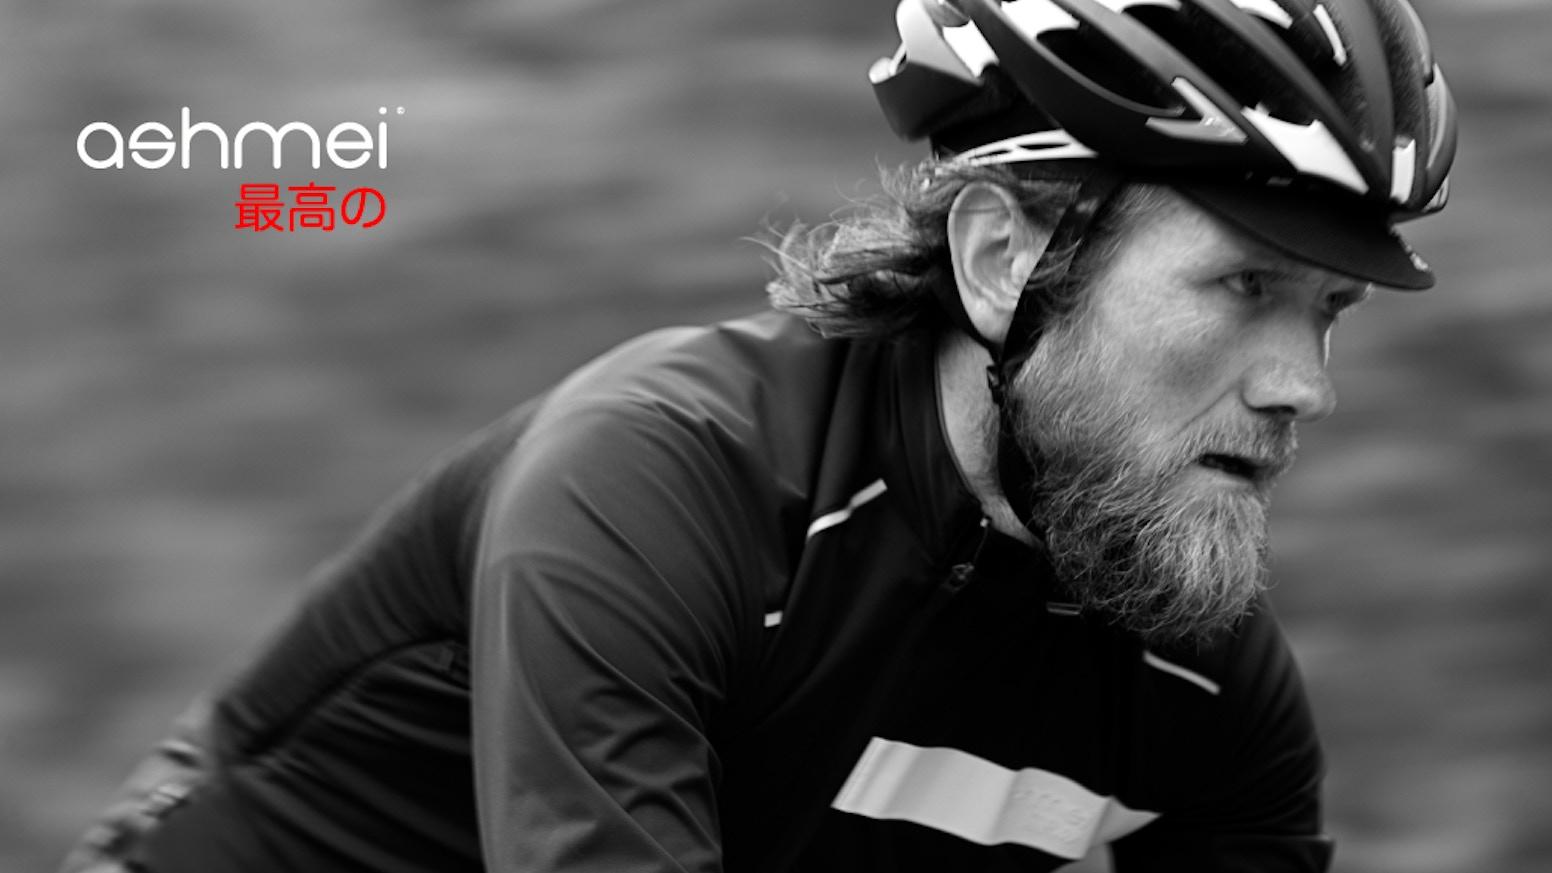 f2c7c446c4b Award winning ashmei sportswear is launching their high performance range  of bike and triathlon apparel.